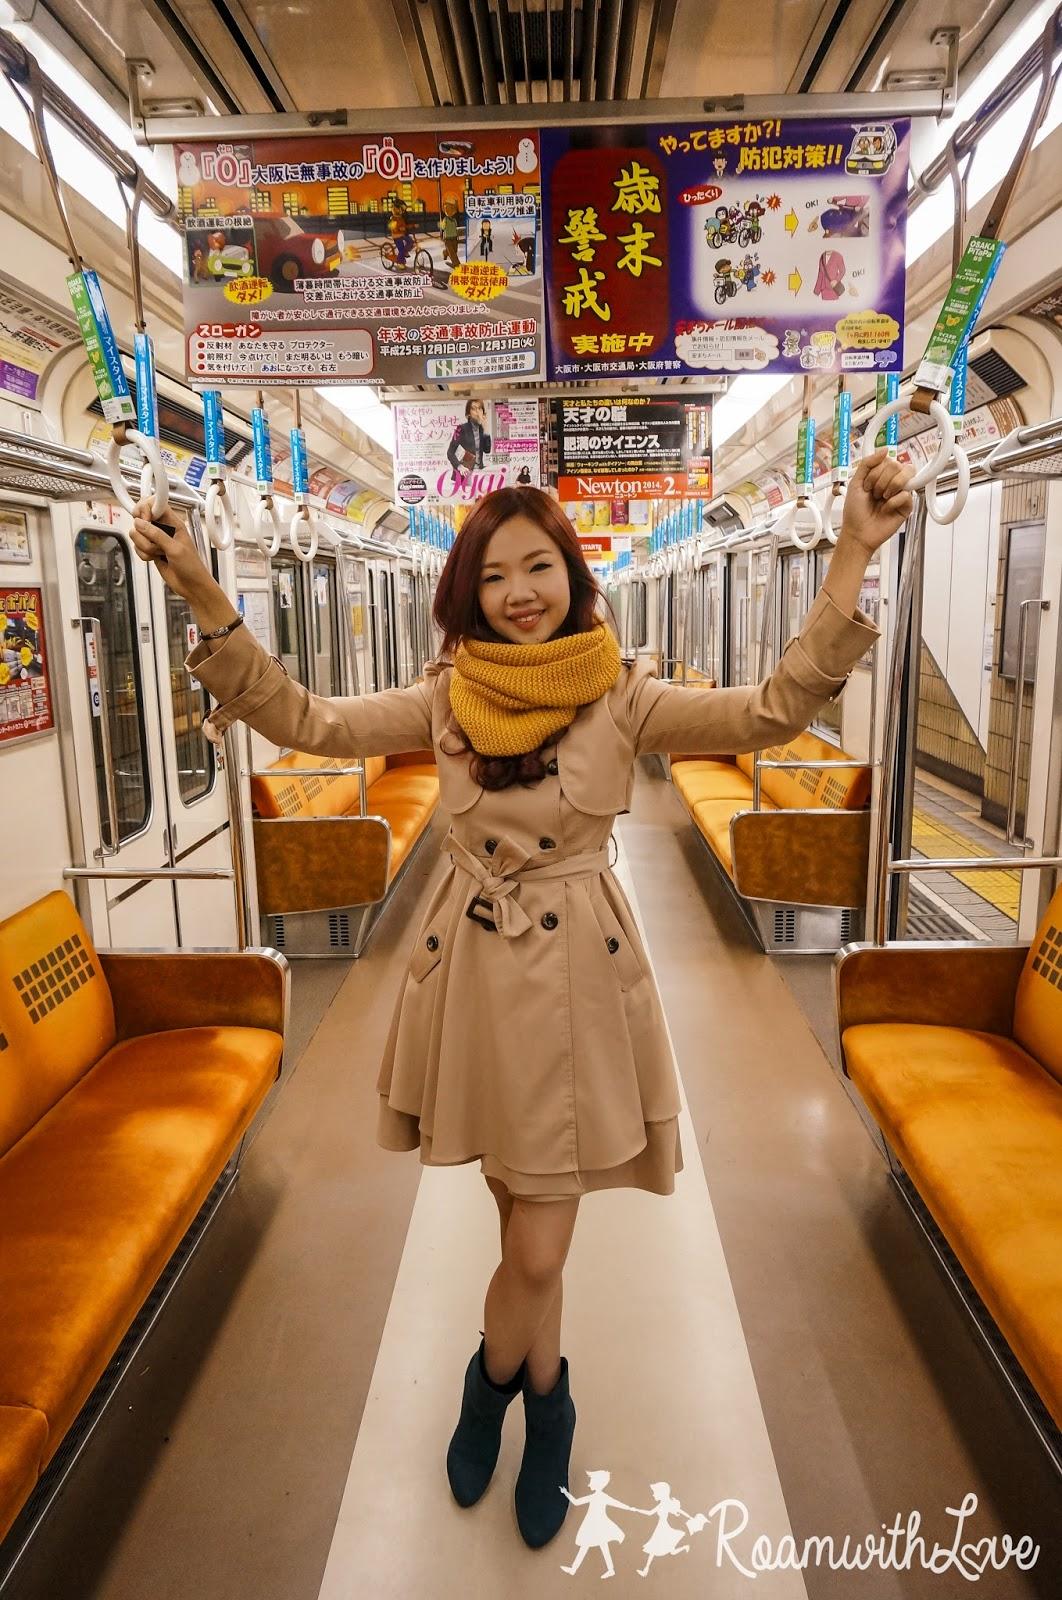 Japan,kyoto,review,เกีนวโต,รีวิว,ทริป,สวีท,ญี่ปุ่น,คันไซ,Kimono,กิโมโน,การเดินทาง